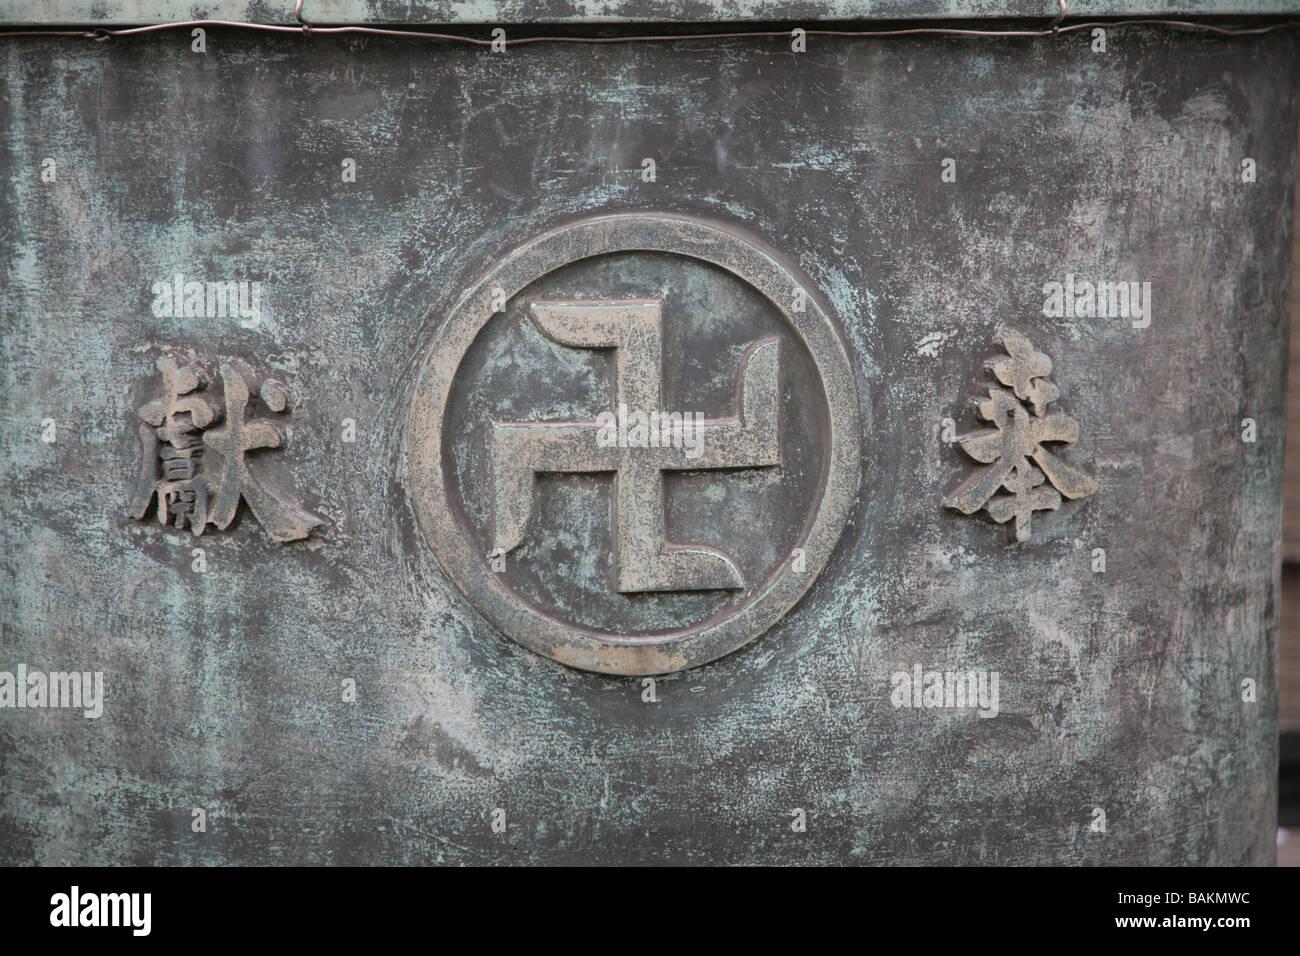 Japan tokyo swastika cross used as a religious symbol in buddhism japan tokyo swastika cross used as a religious symbol in buddhism biocorpaavc